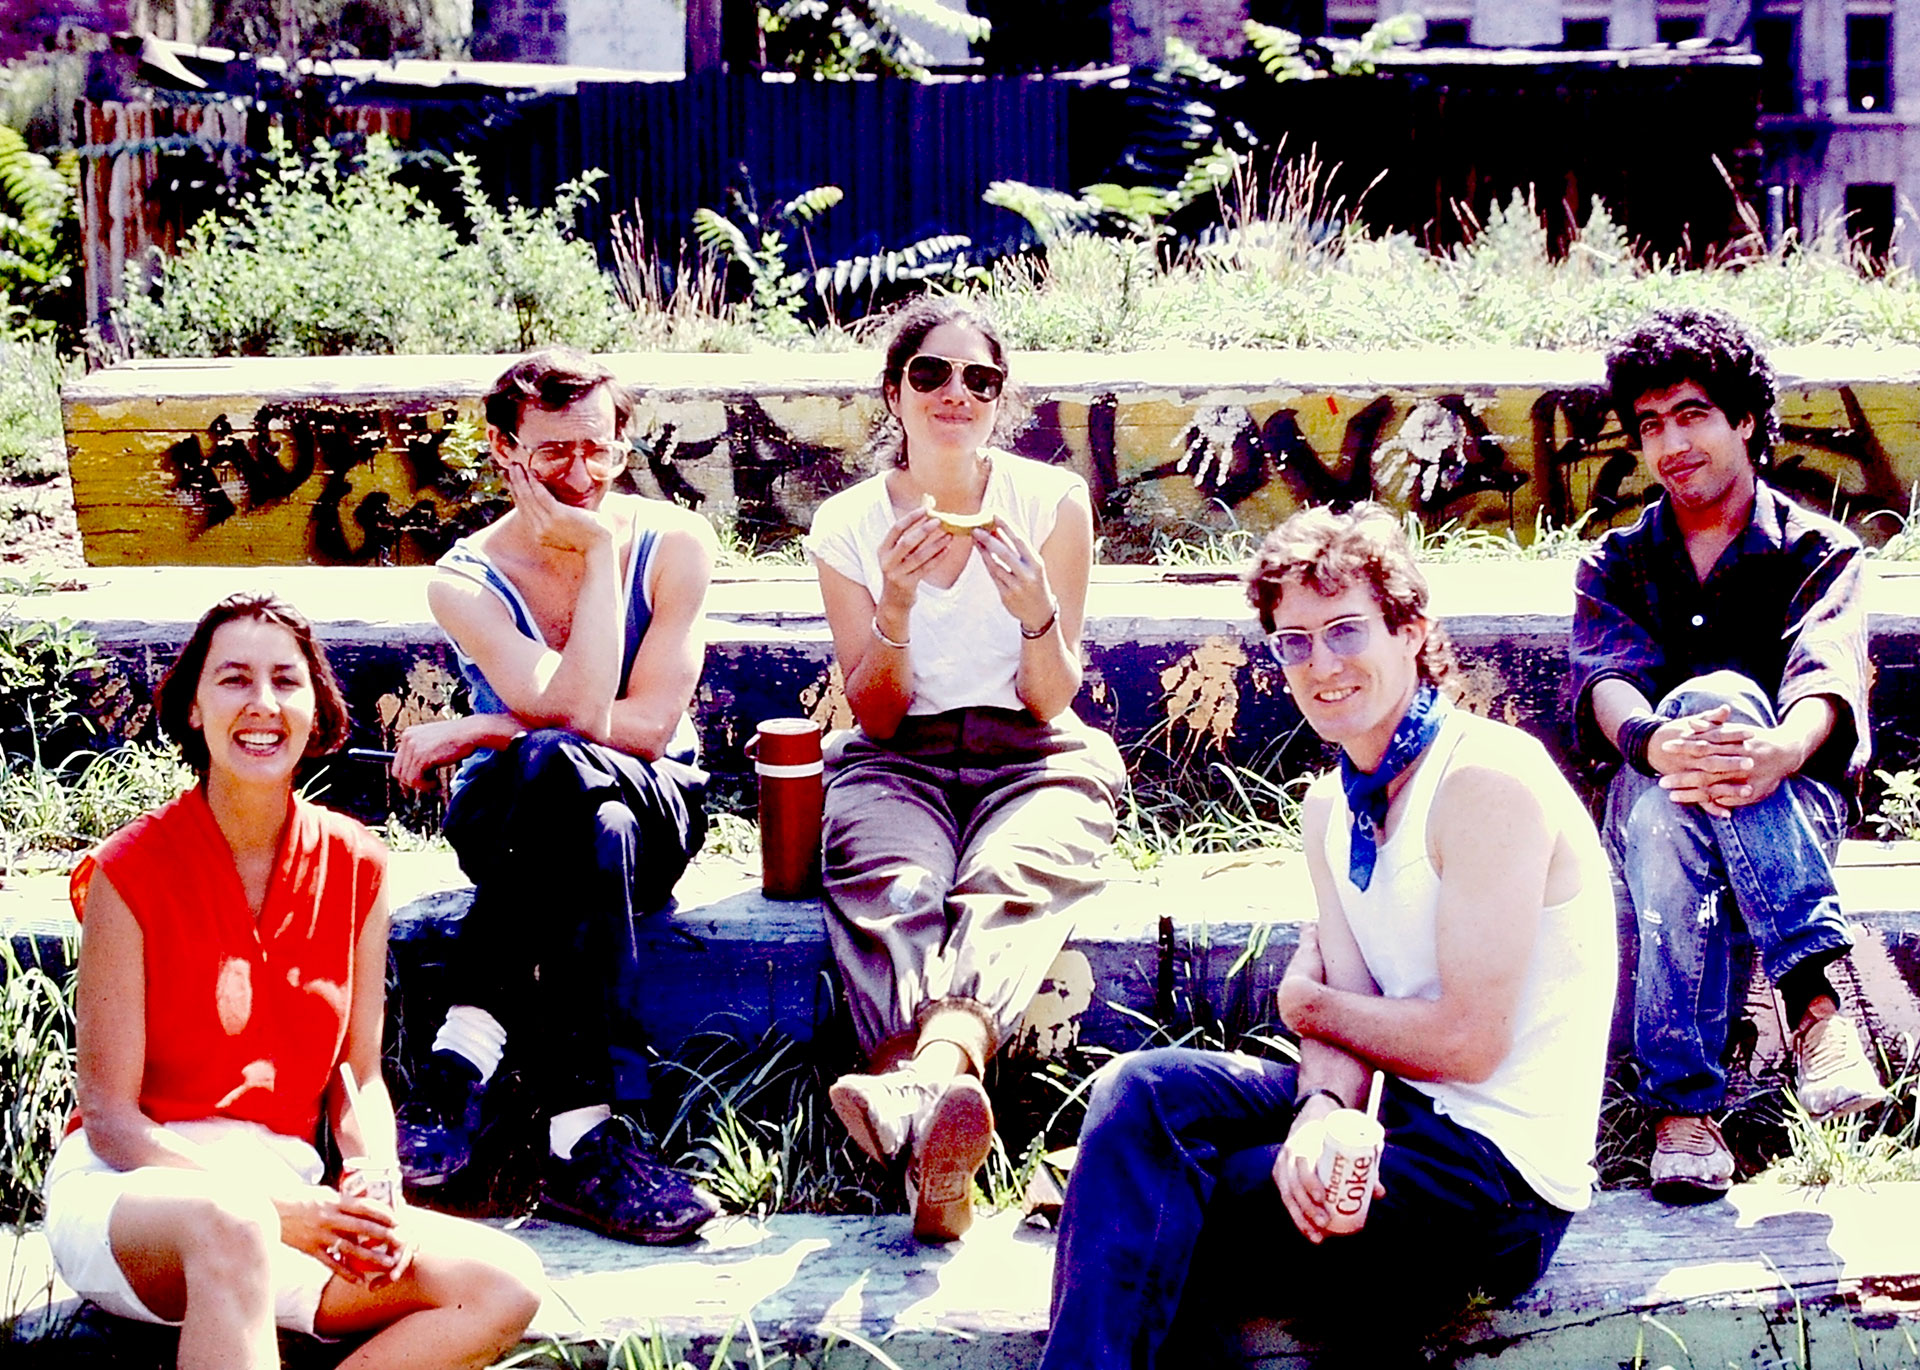 Camille Perrottet, Noah Baen, Rikki Asher, Keith Christensen, Hamid Irbouh   Photo © Joe Stephenson